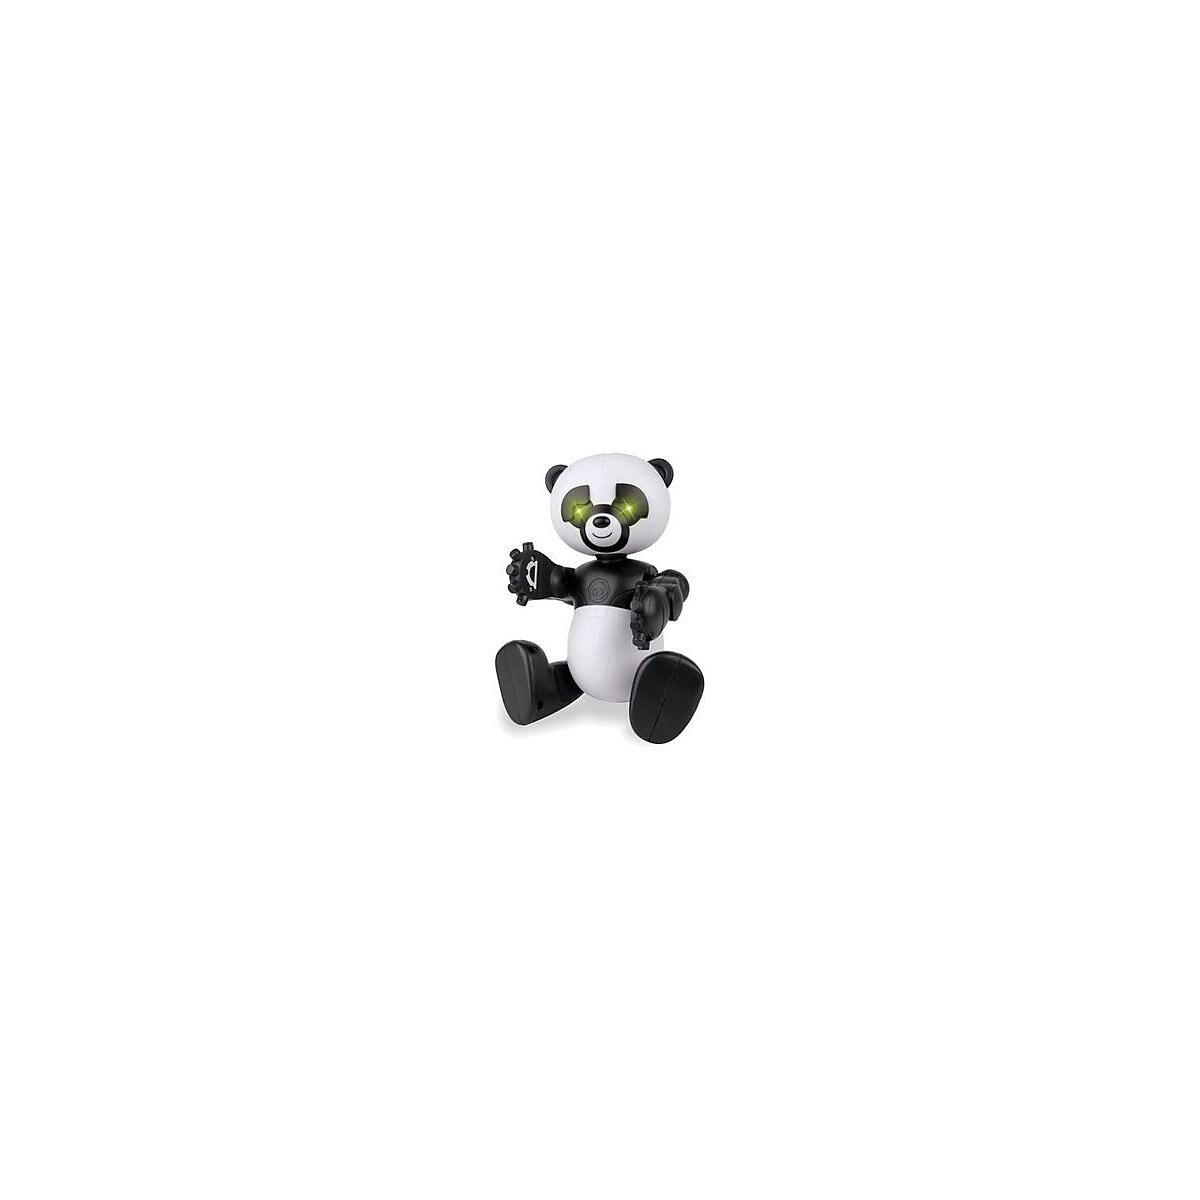 Electronic Pets WowWee 7925663 Tamagochi Robot Toys Interactive Dog Animals Kids MTpromo